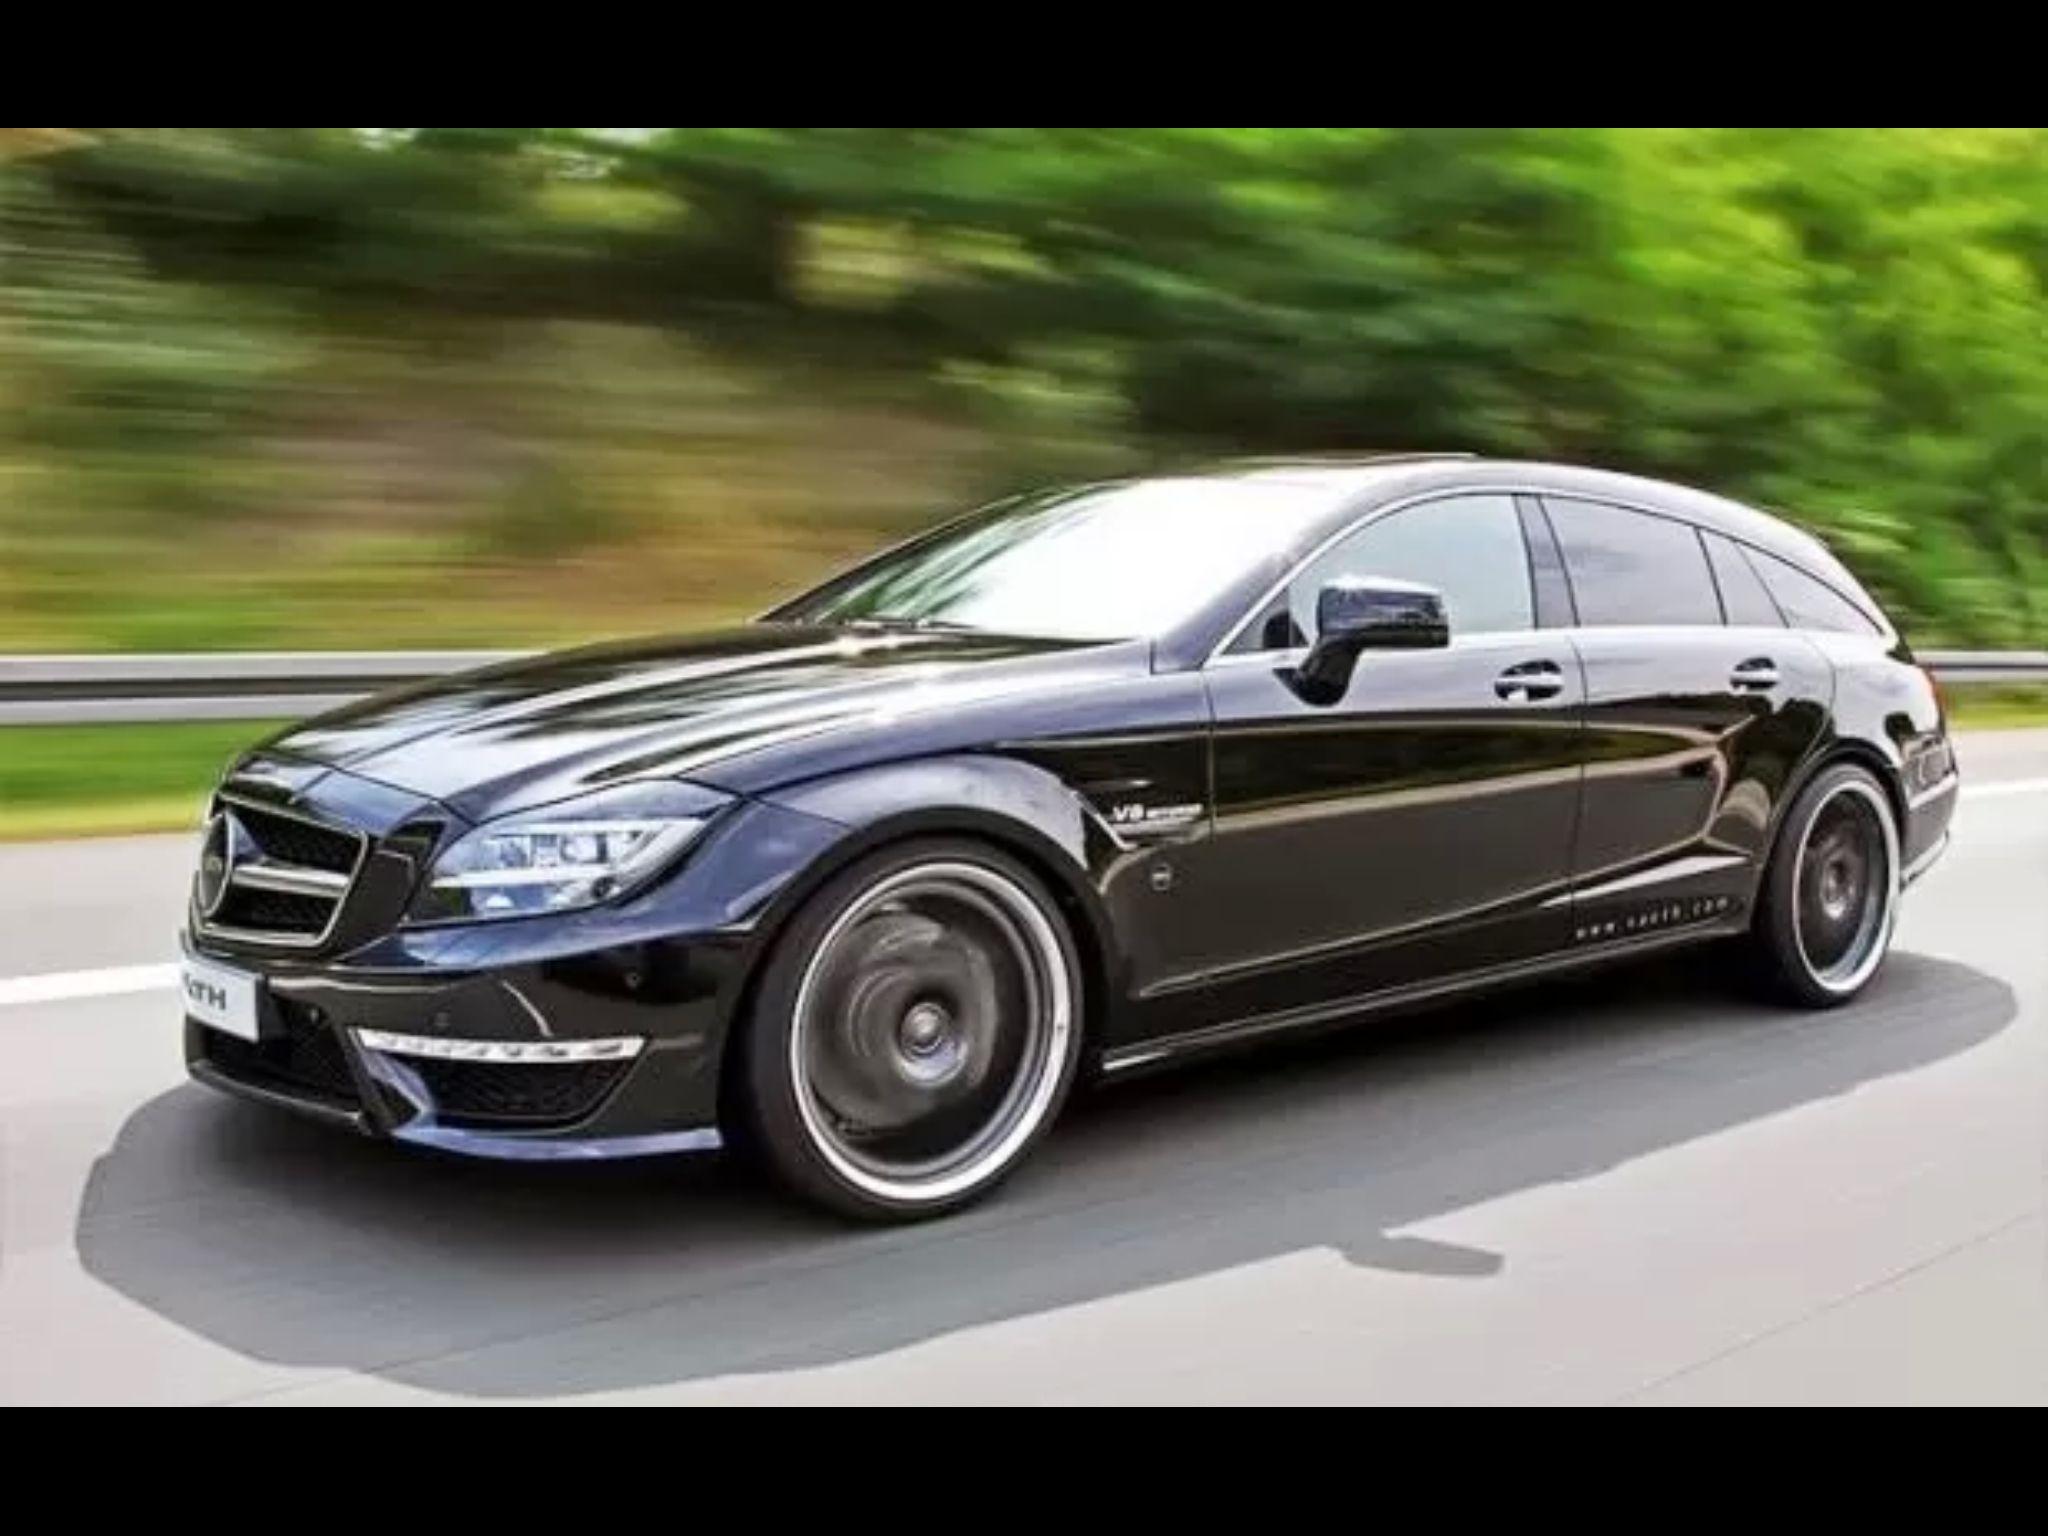 Mercedes Cls Shooting Brake Mercedesbenzofhuntvalley Mercedes